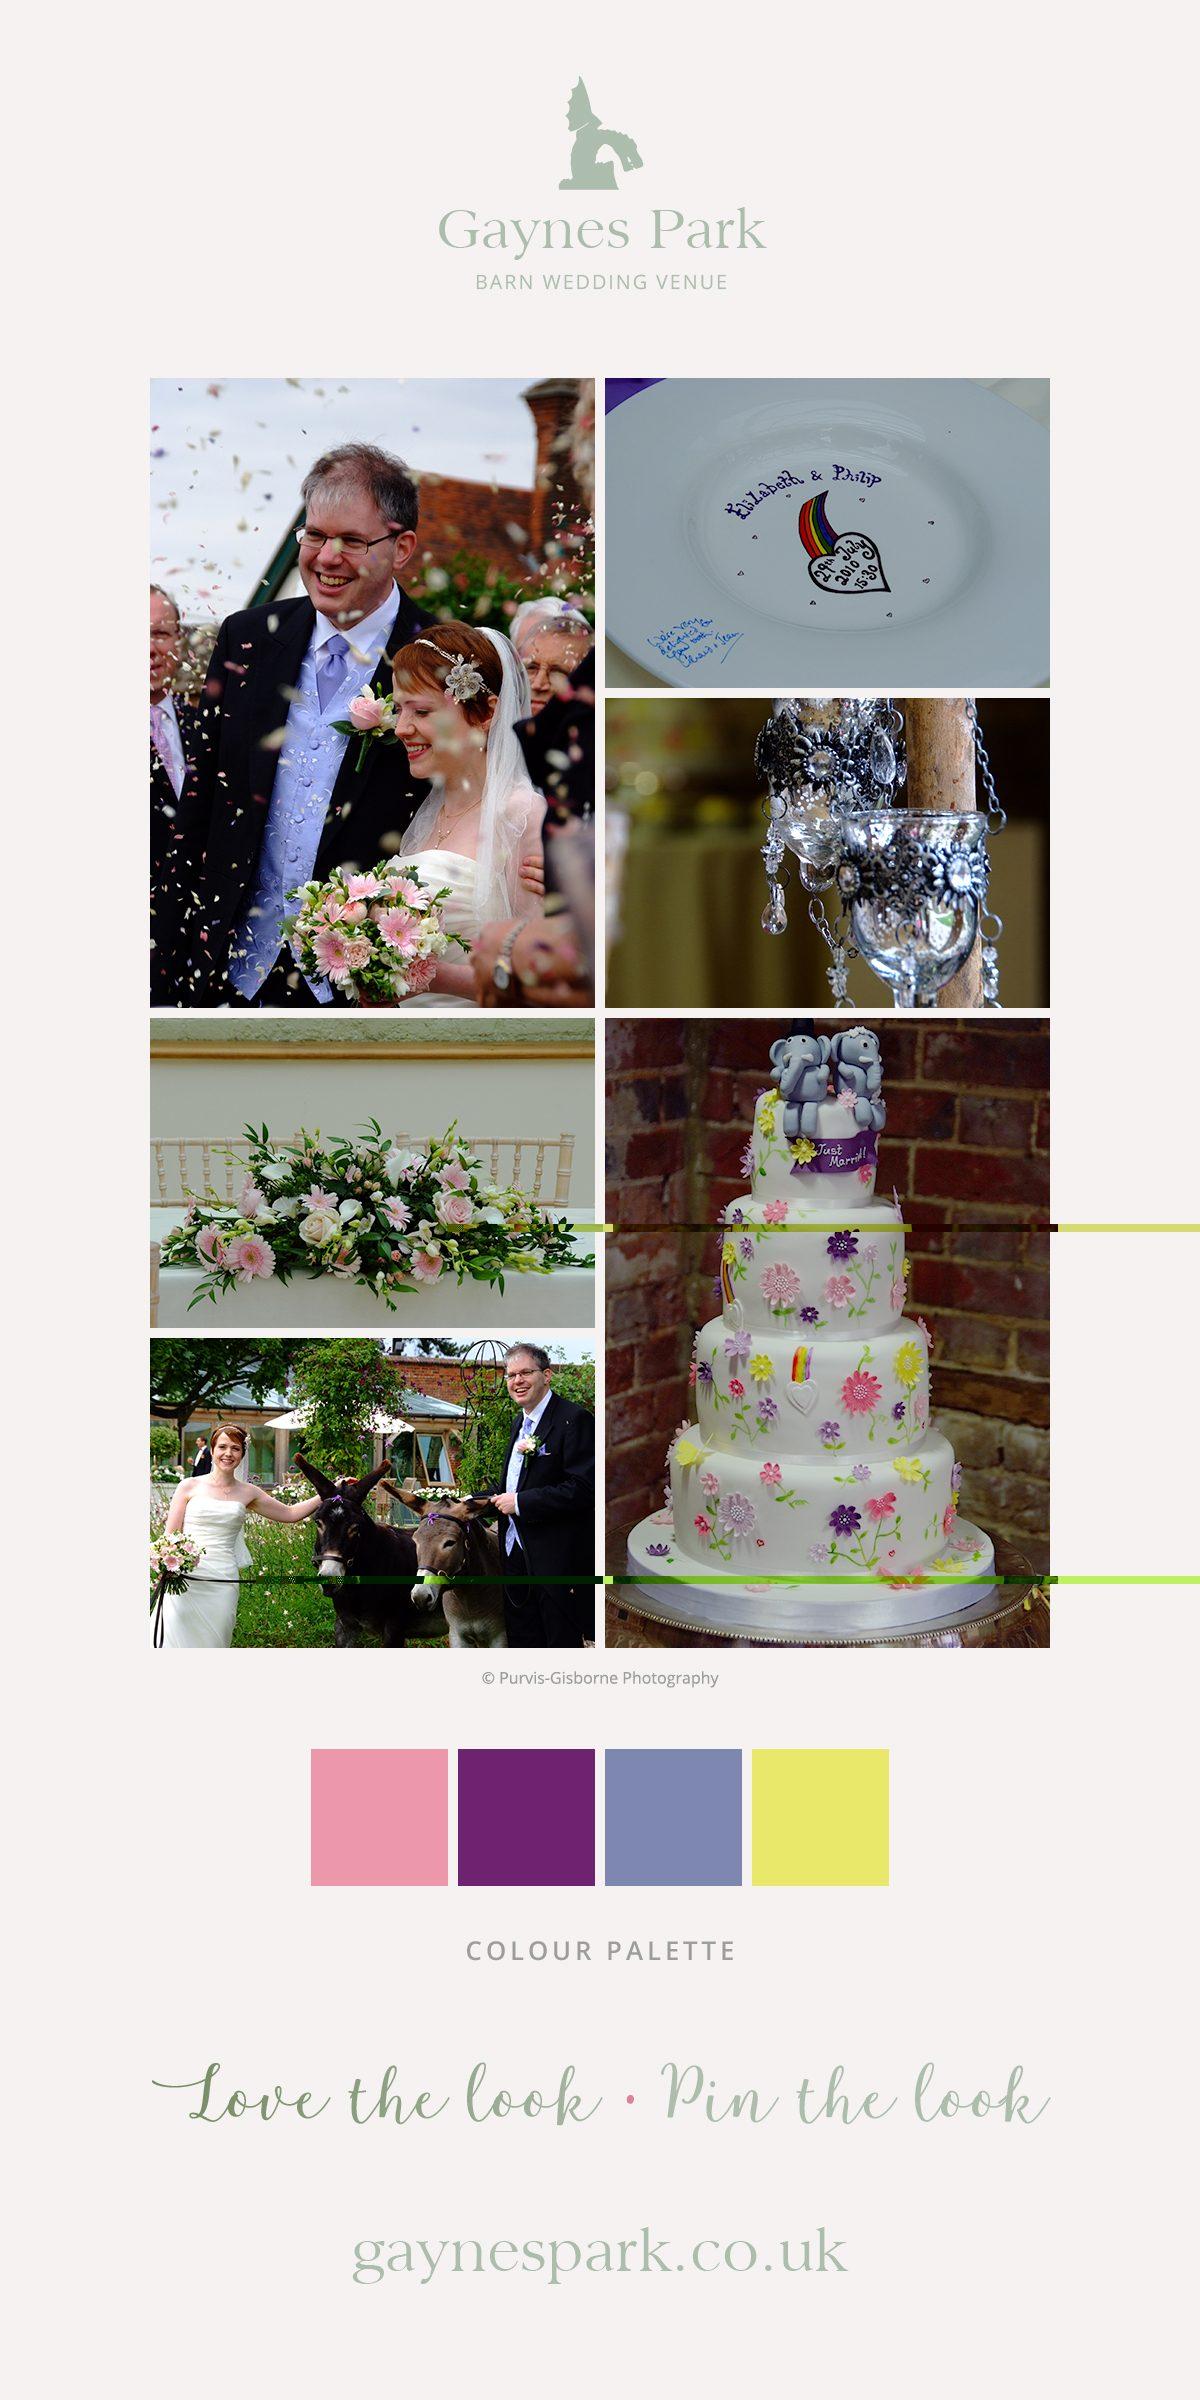 Elizabeth and Philip's real life wedding at Gaynes Park